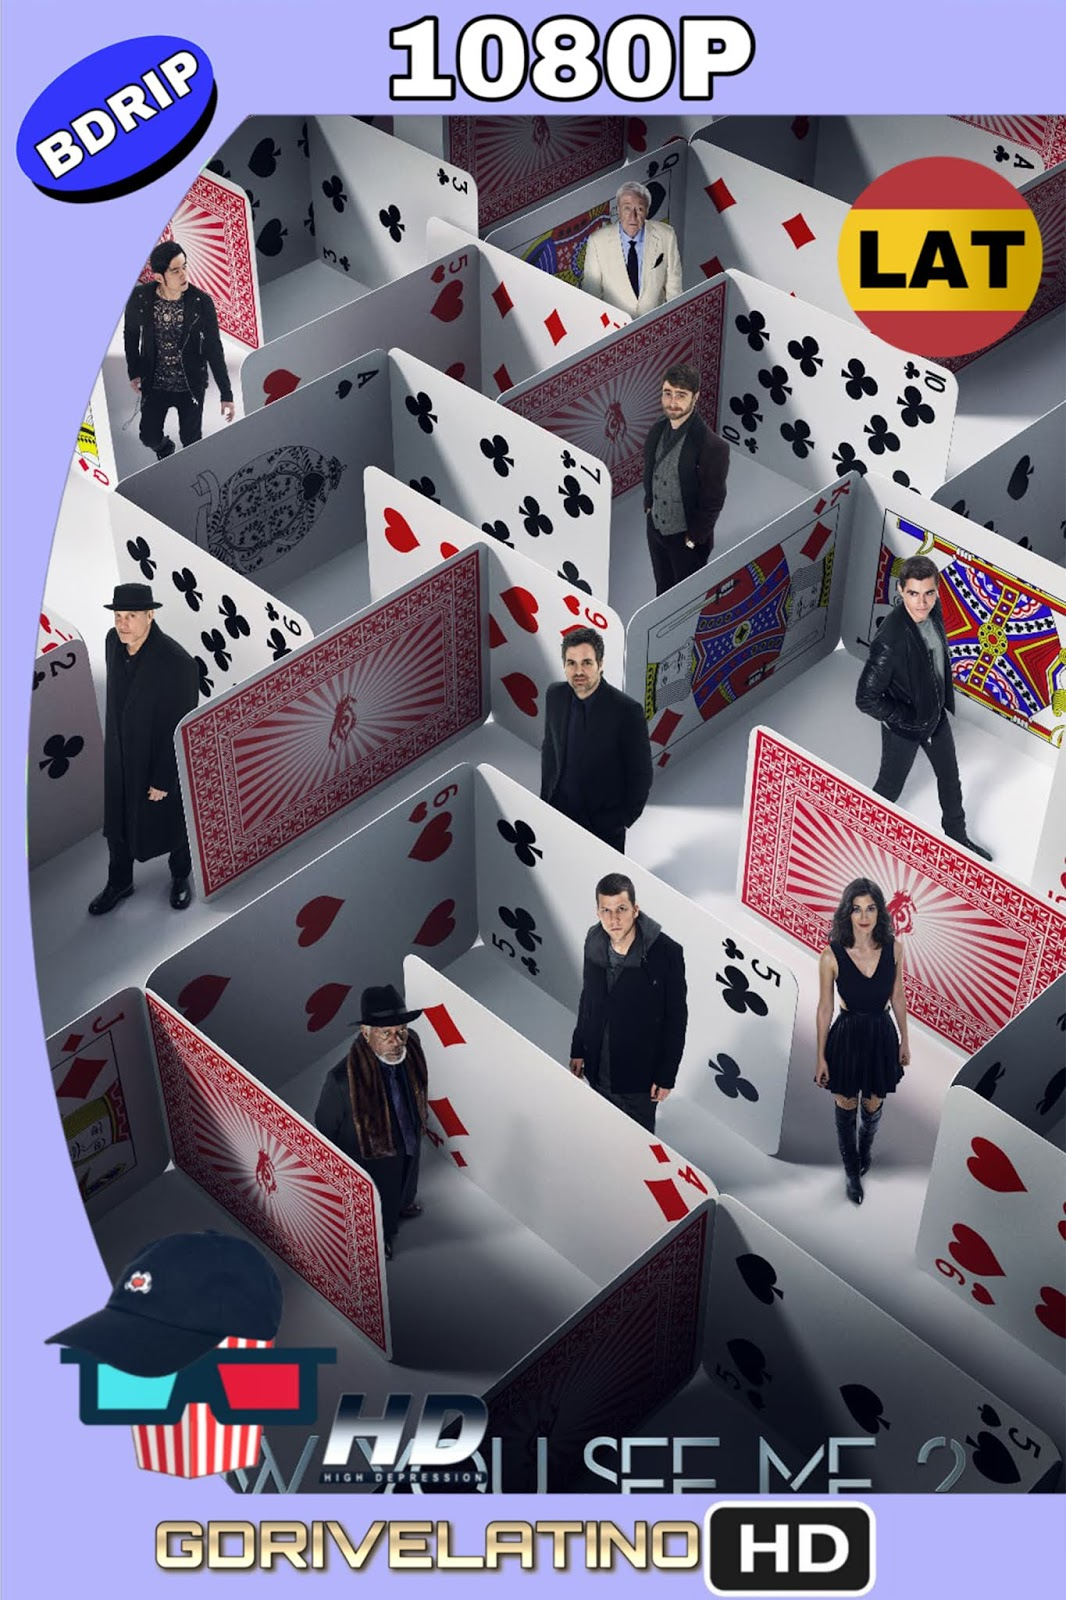 Los ilusionistas 2 (2016) BDRip 1080p (Latino – Inglés) MKV